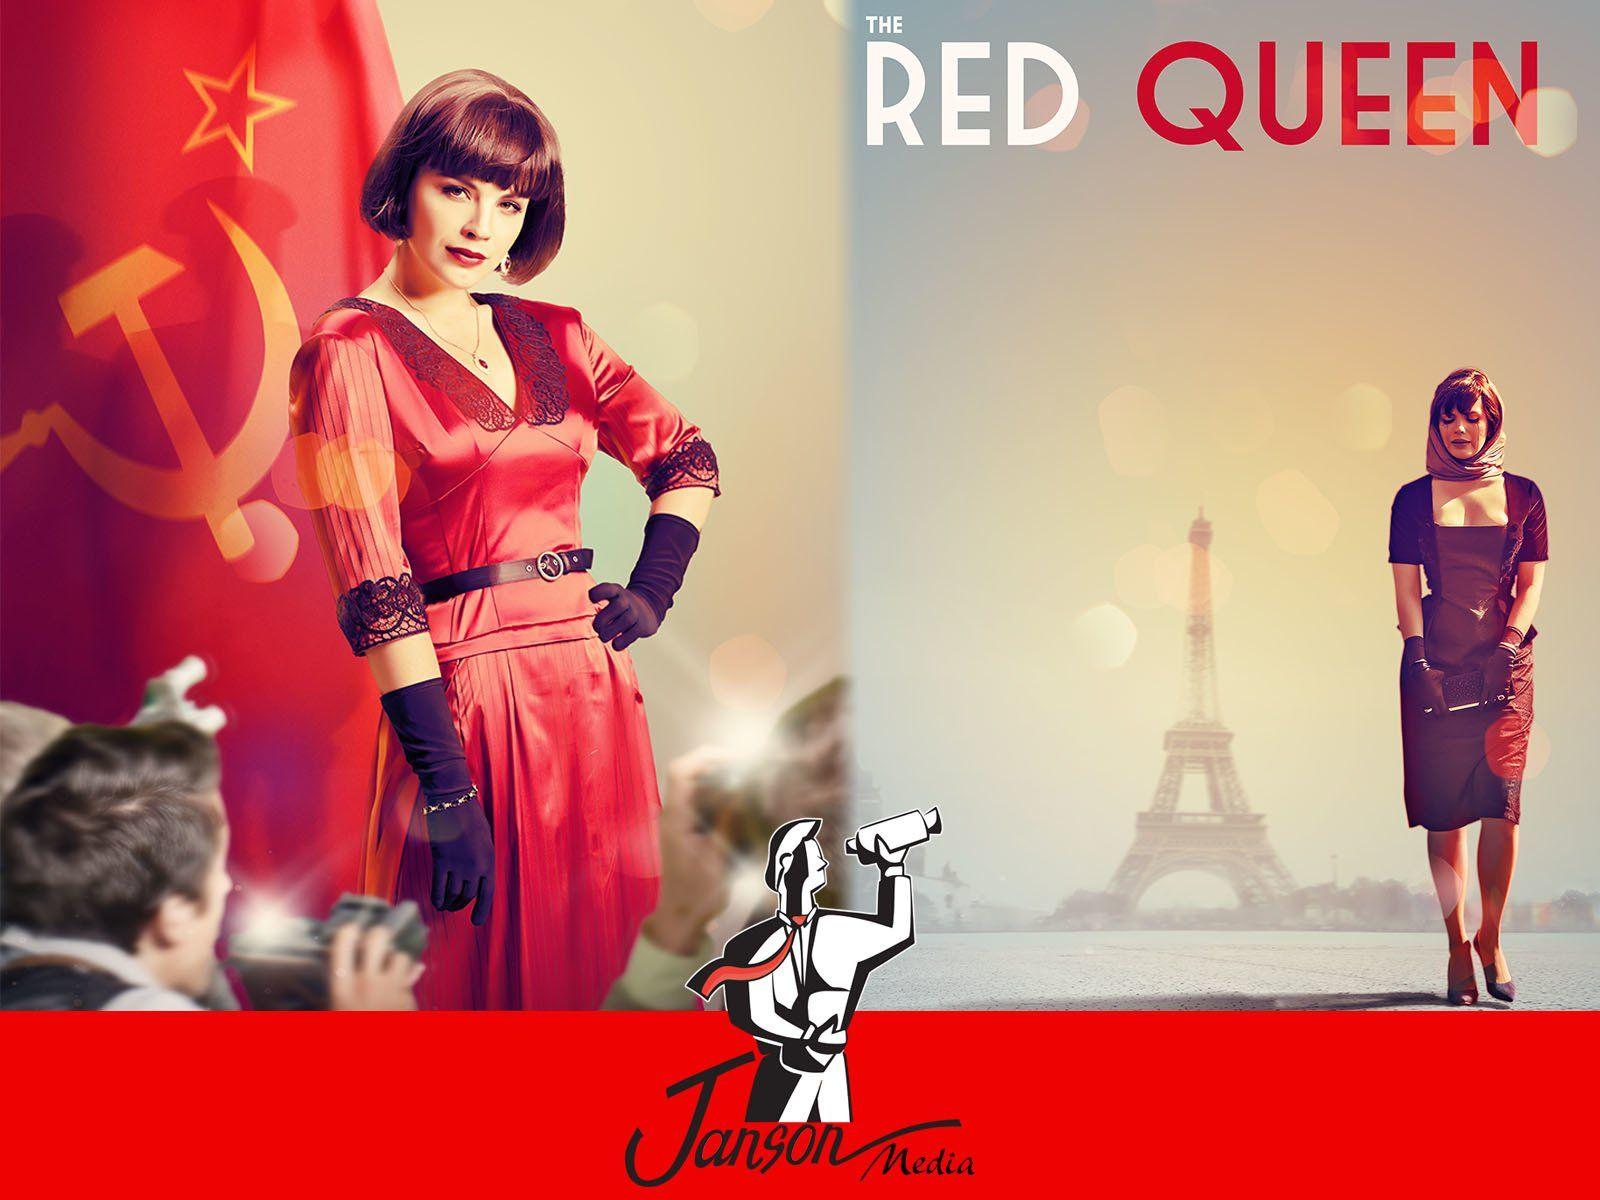 AmazonPrime Red queen movie, Red queen, Amazon instant